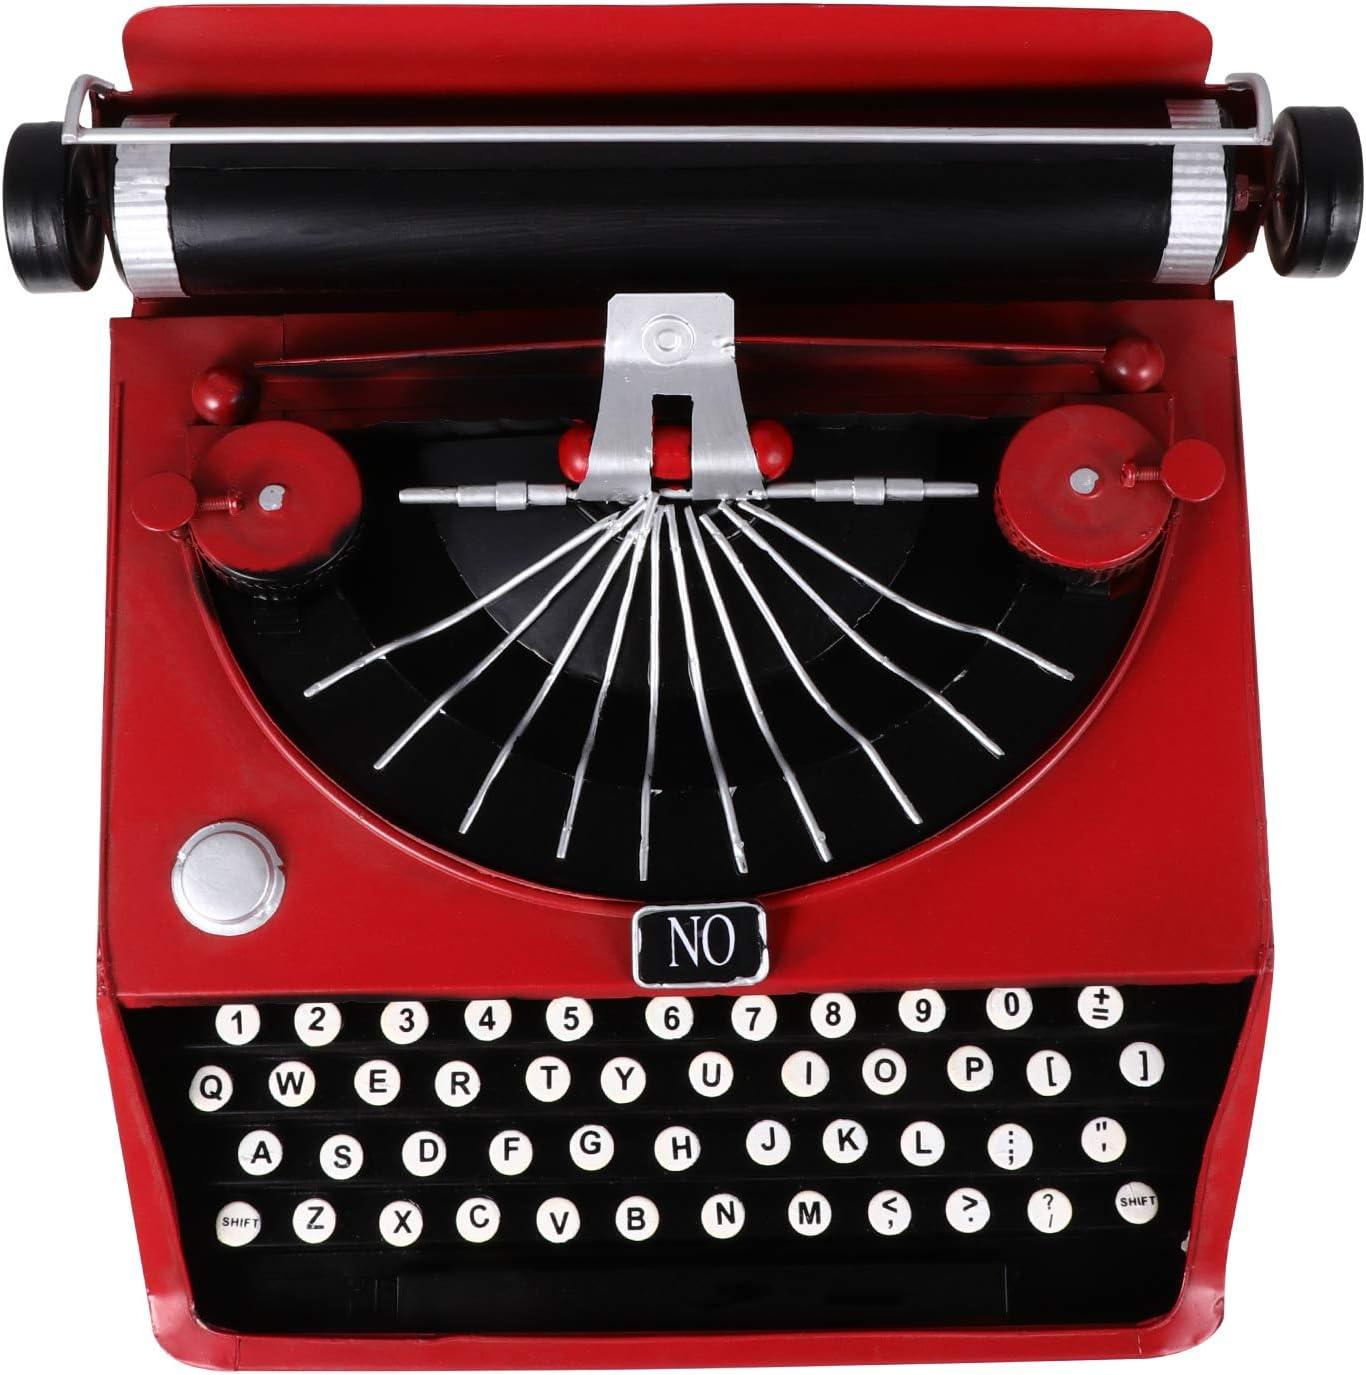 BESPORTBLE Vintage Max Save money 82% OFF Typewriter Retro Model Manual Type